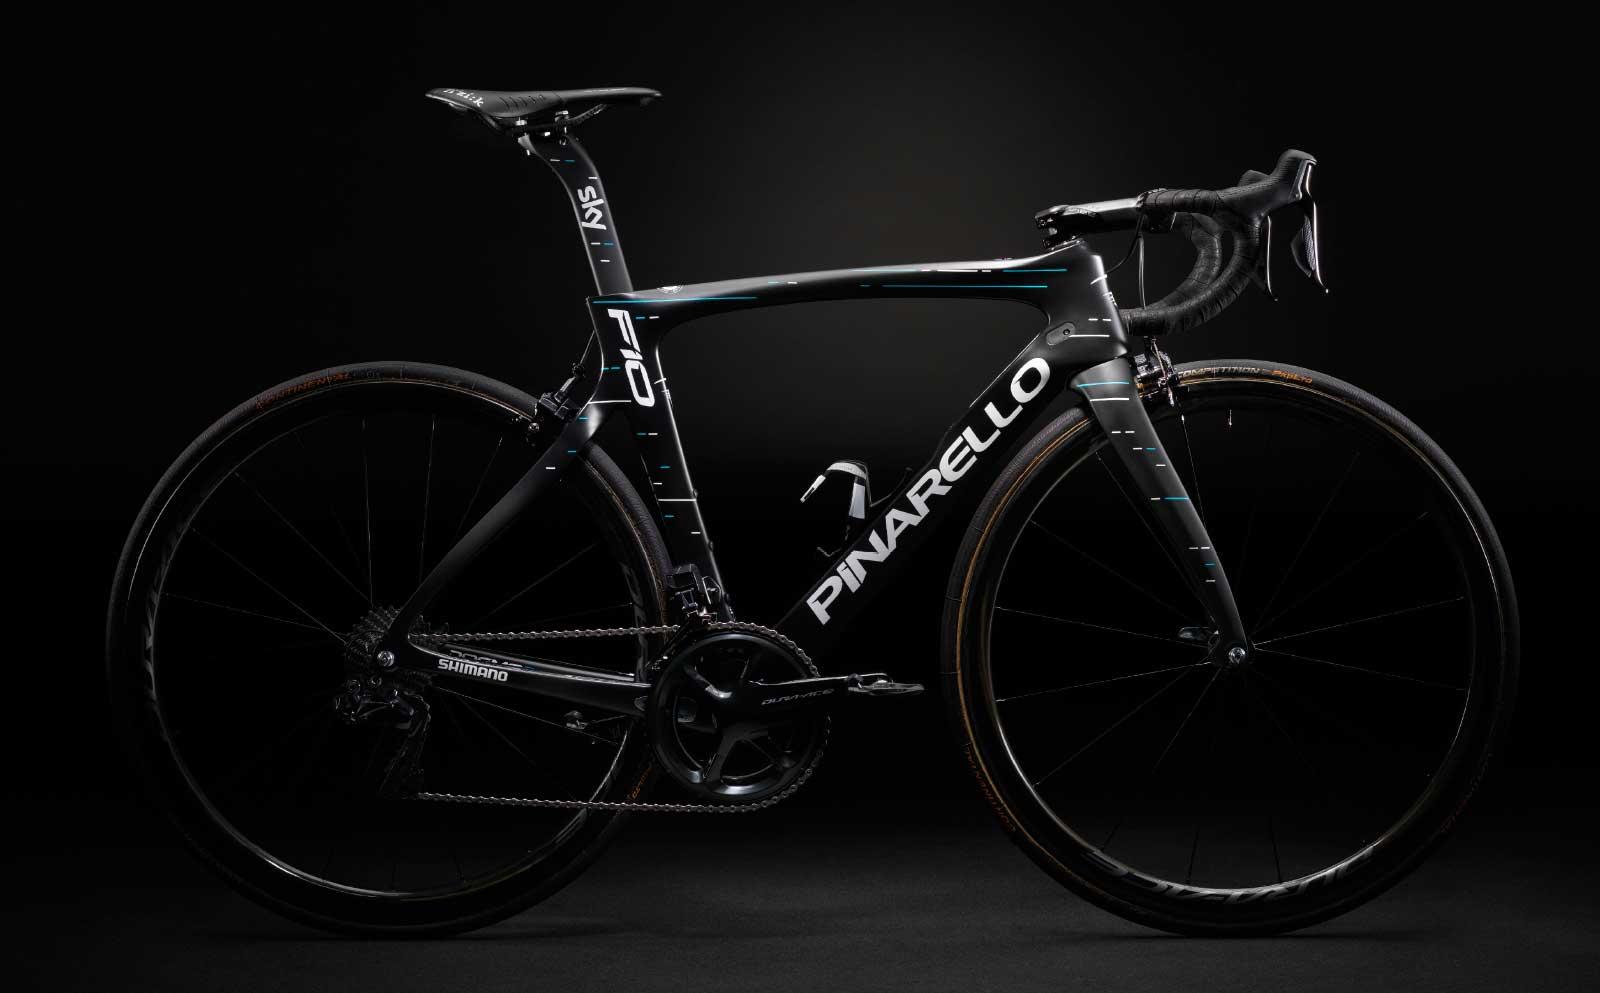 bici del Team Sky